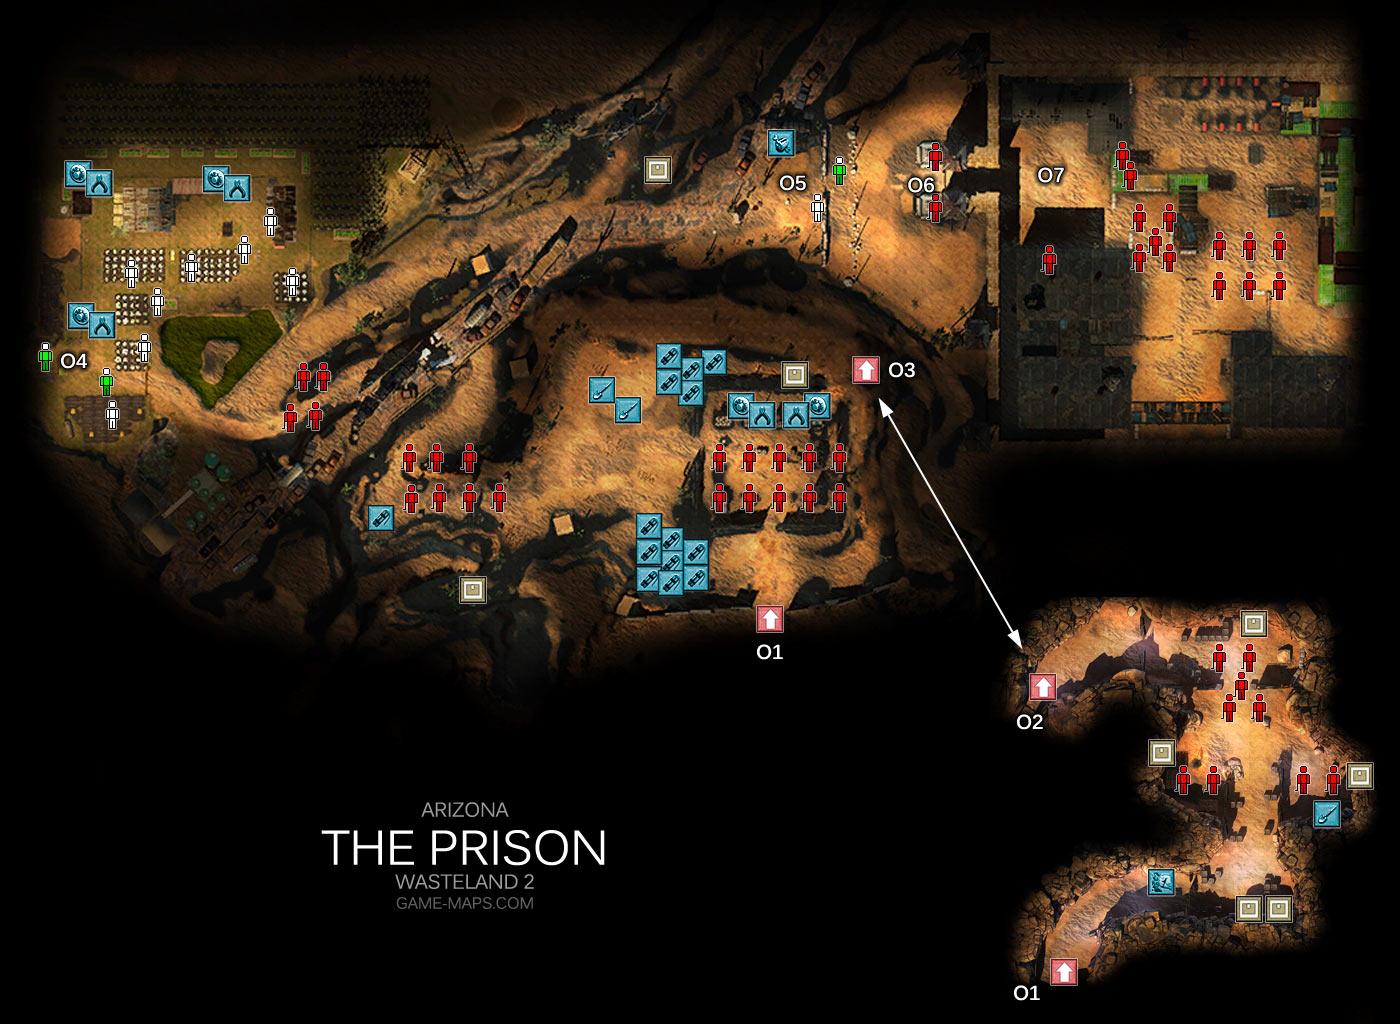 Map Of Arizona Prisons.The Prison Map Arizona Wasteland 2 Game Maps Com